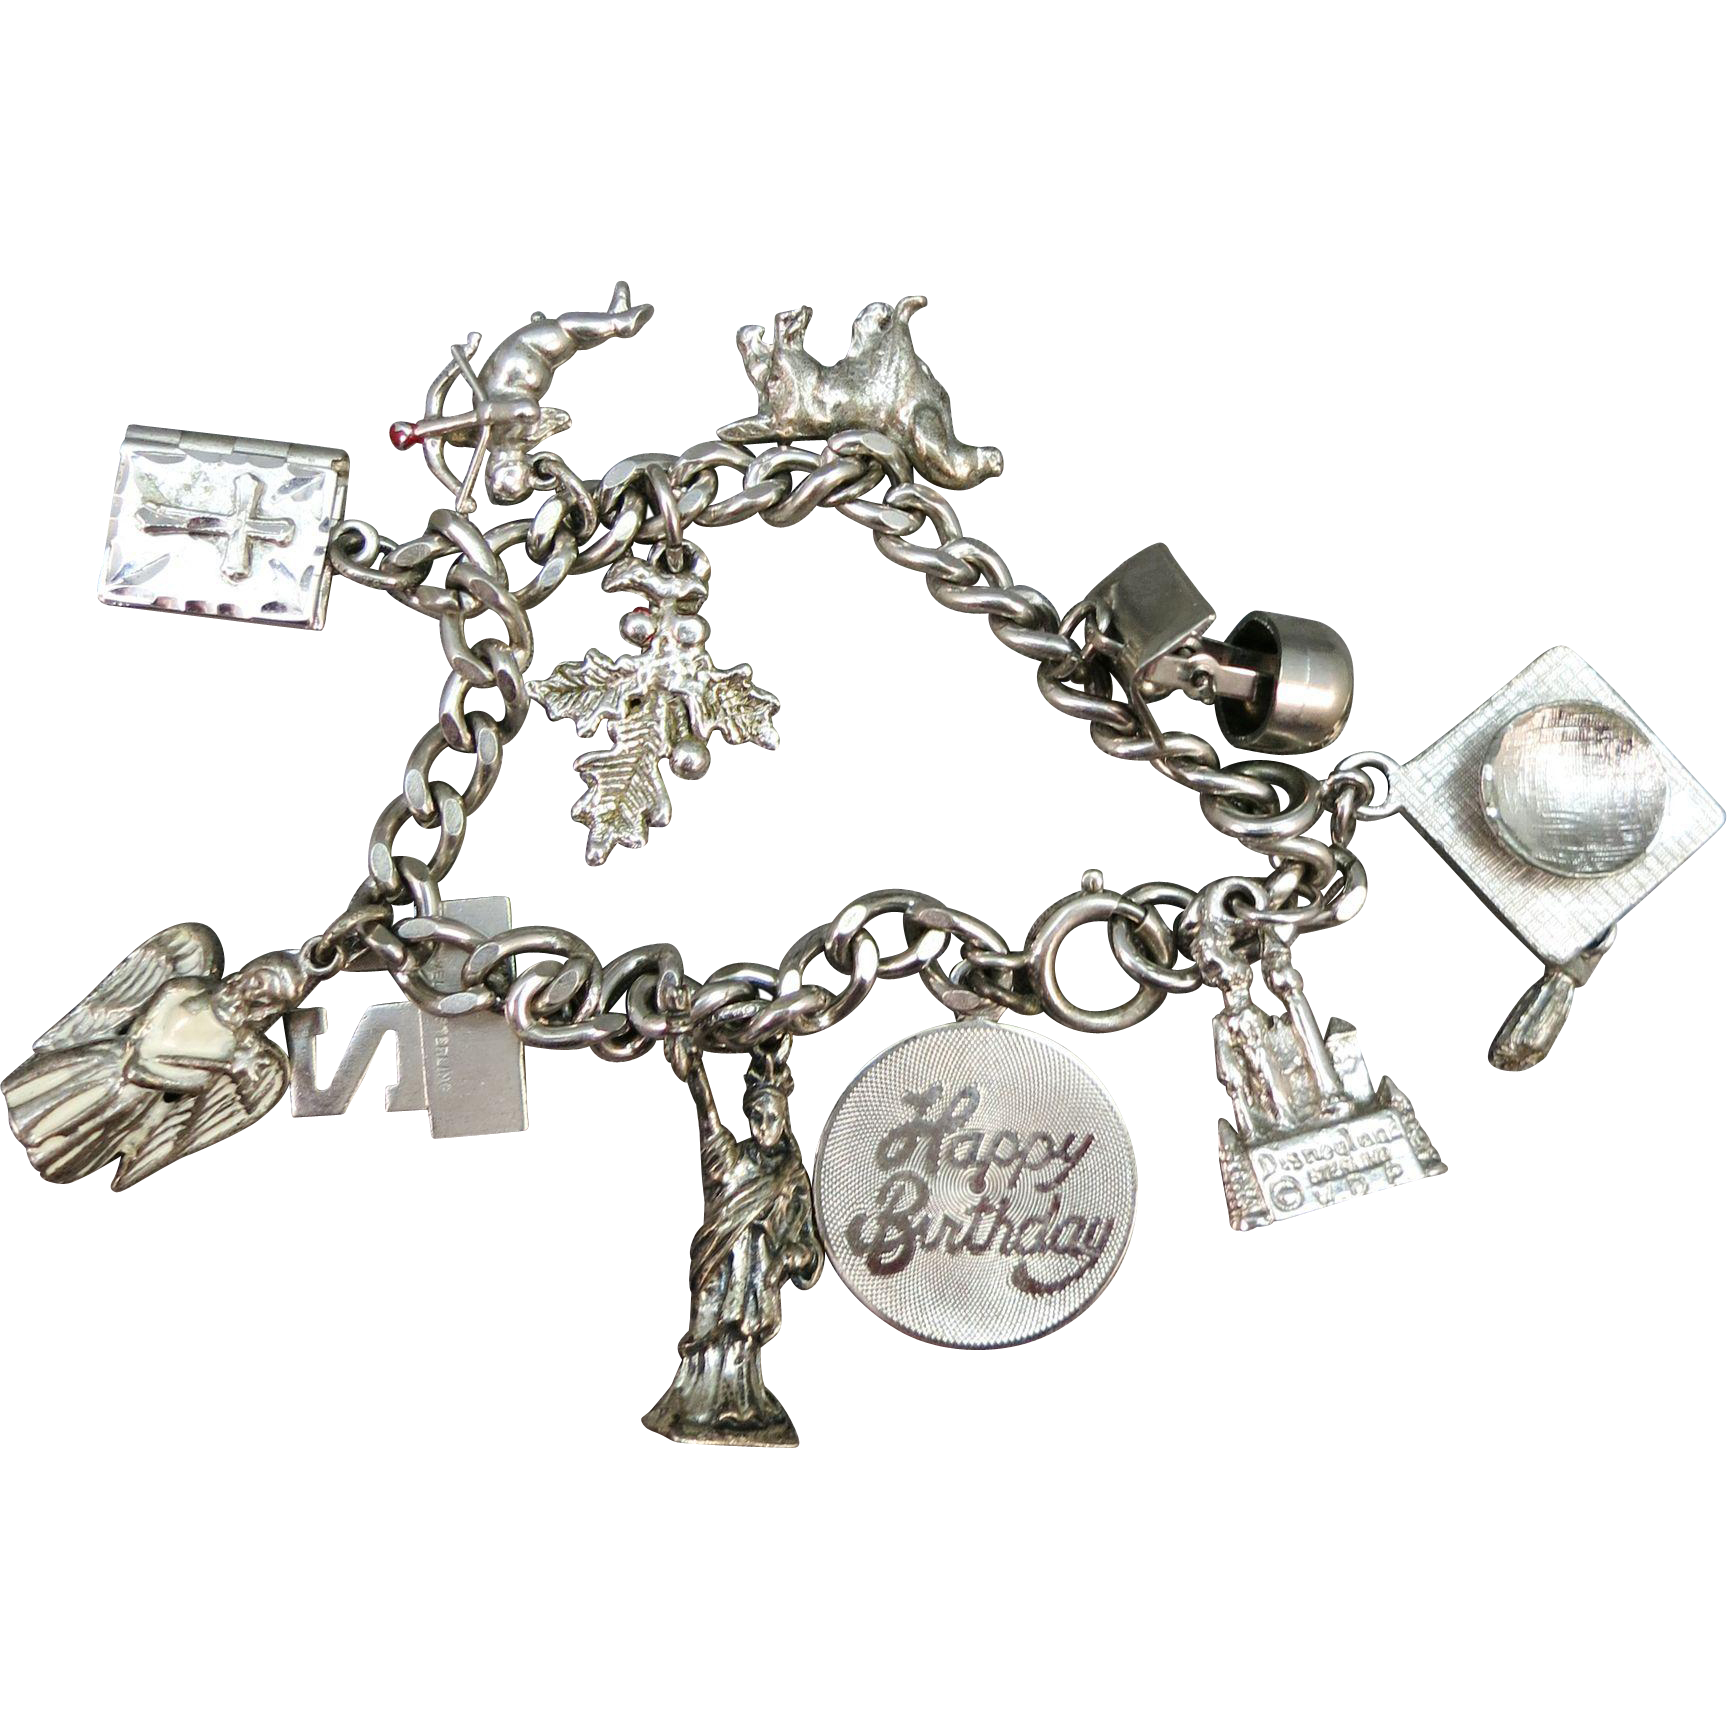 VINTAGE 60'S Stering Charm Bracelet   10 Charms